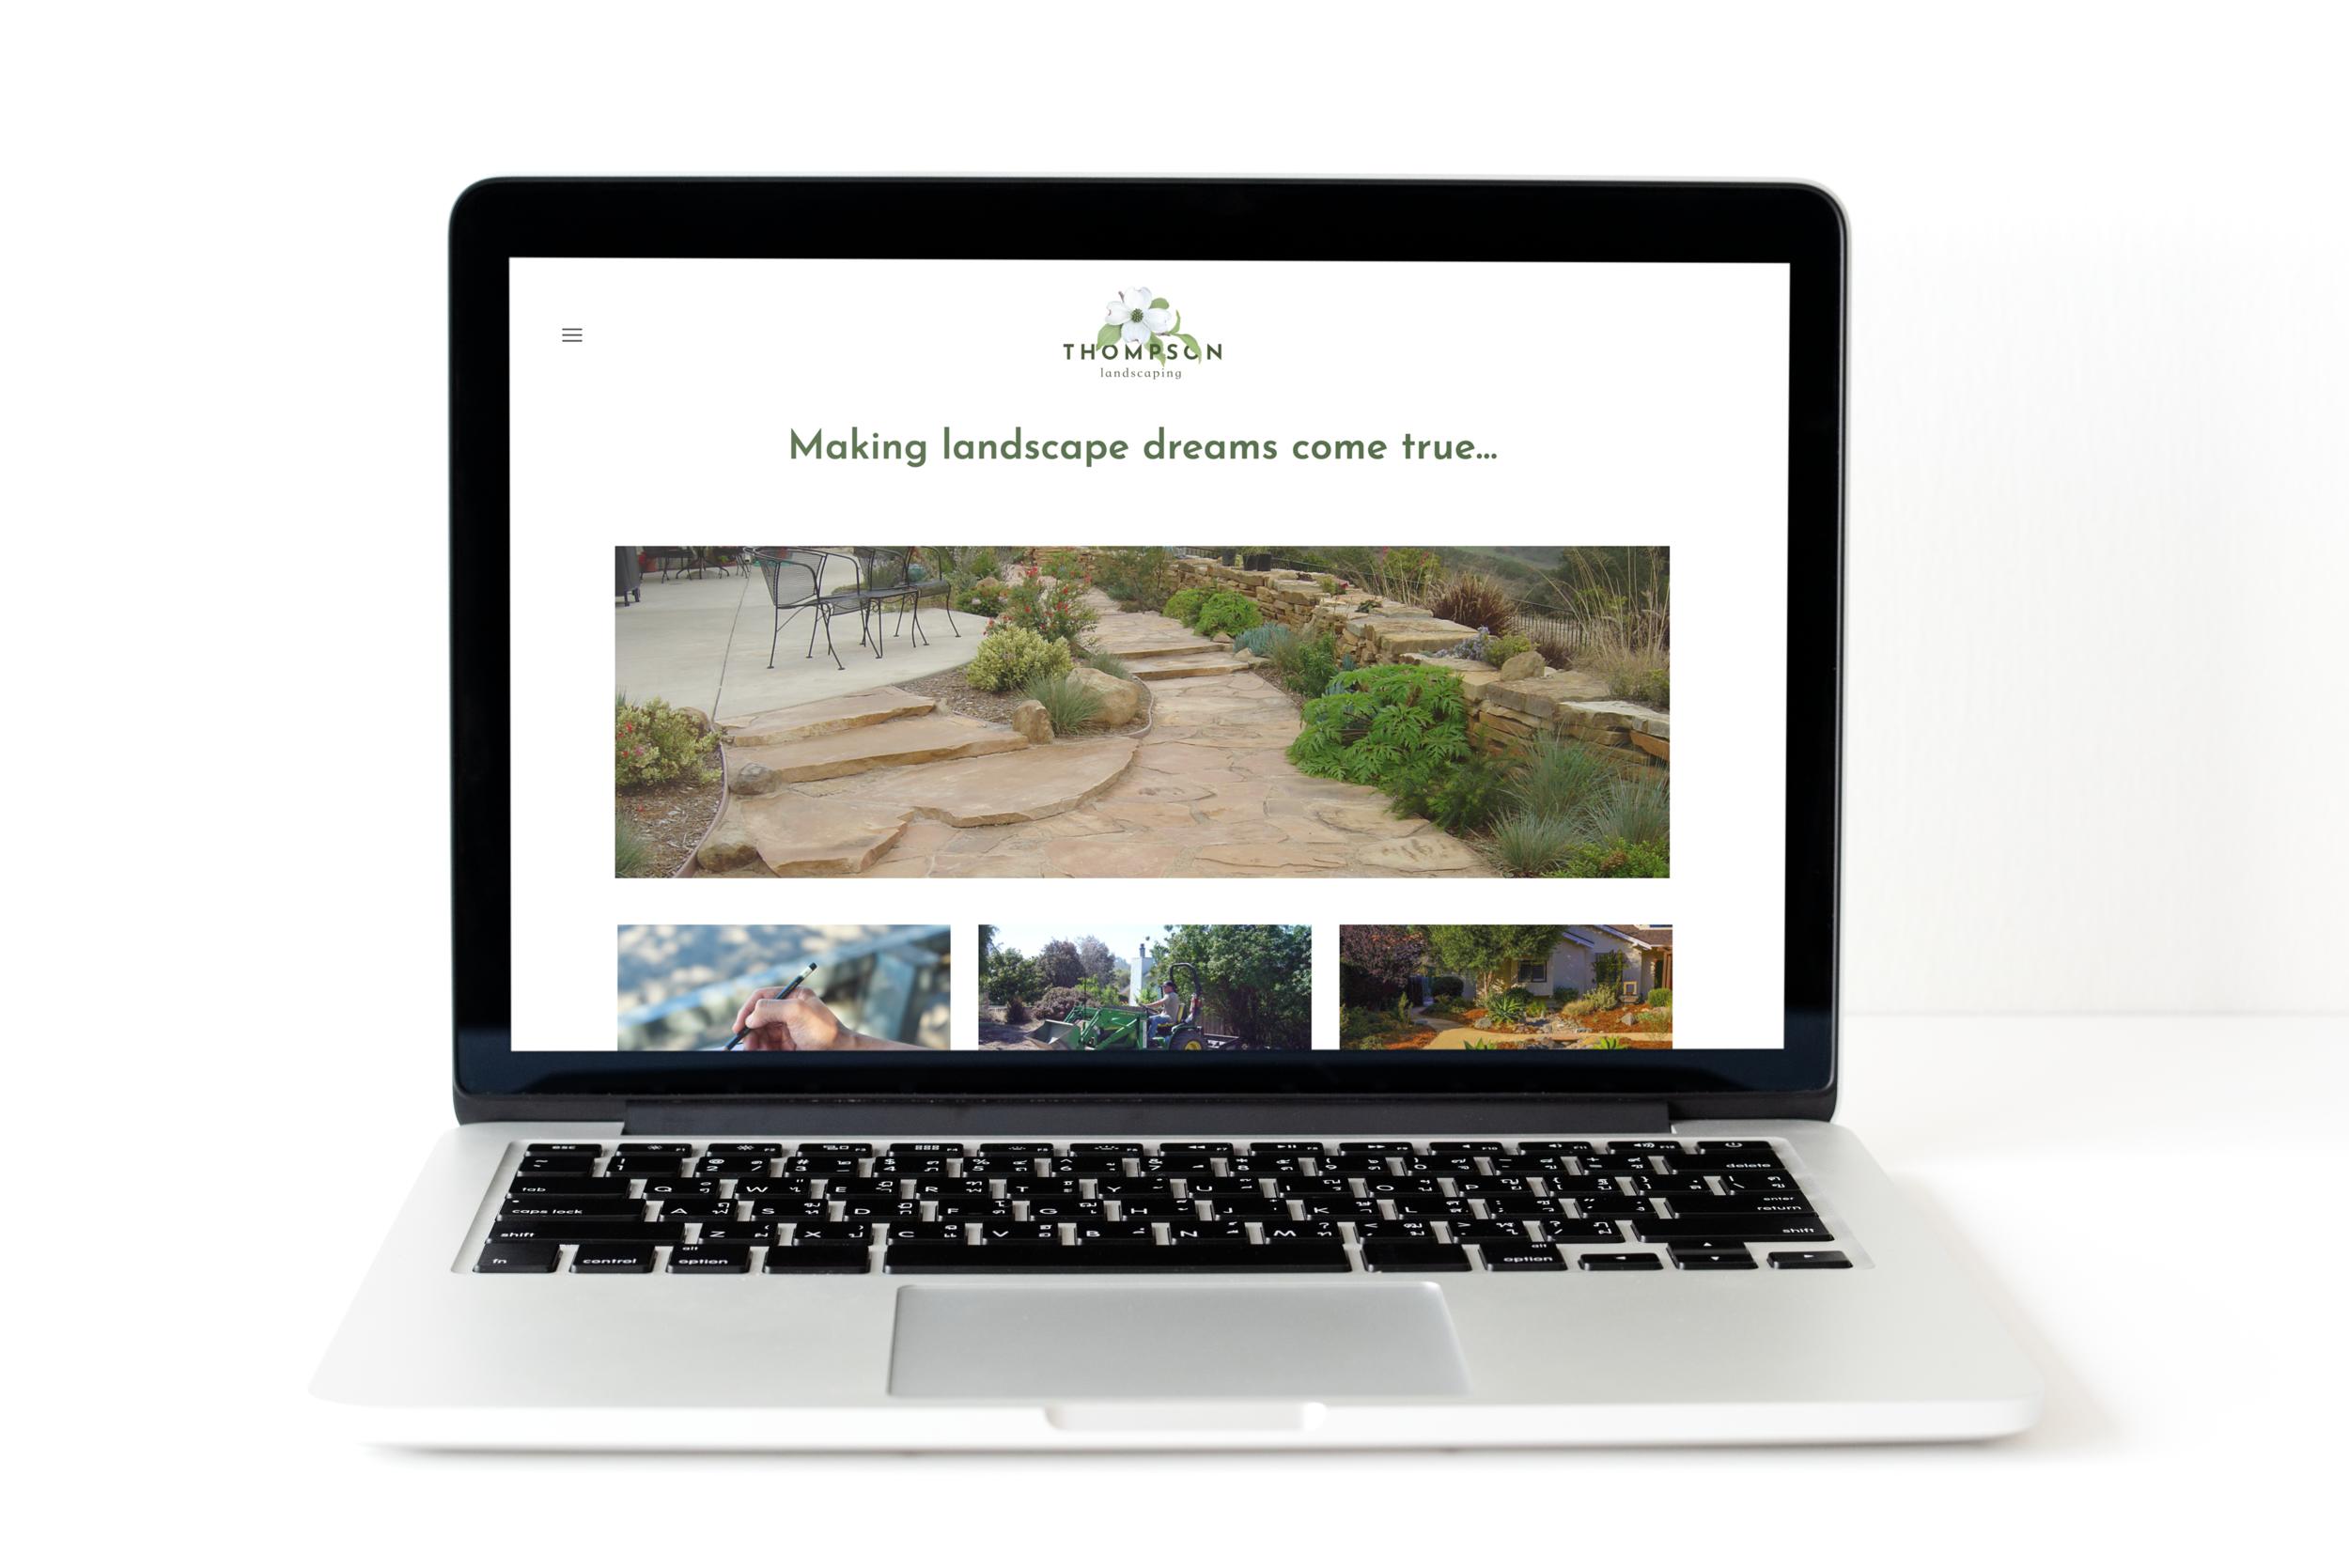 Thompson Landscaping - Website and logo design